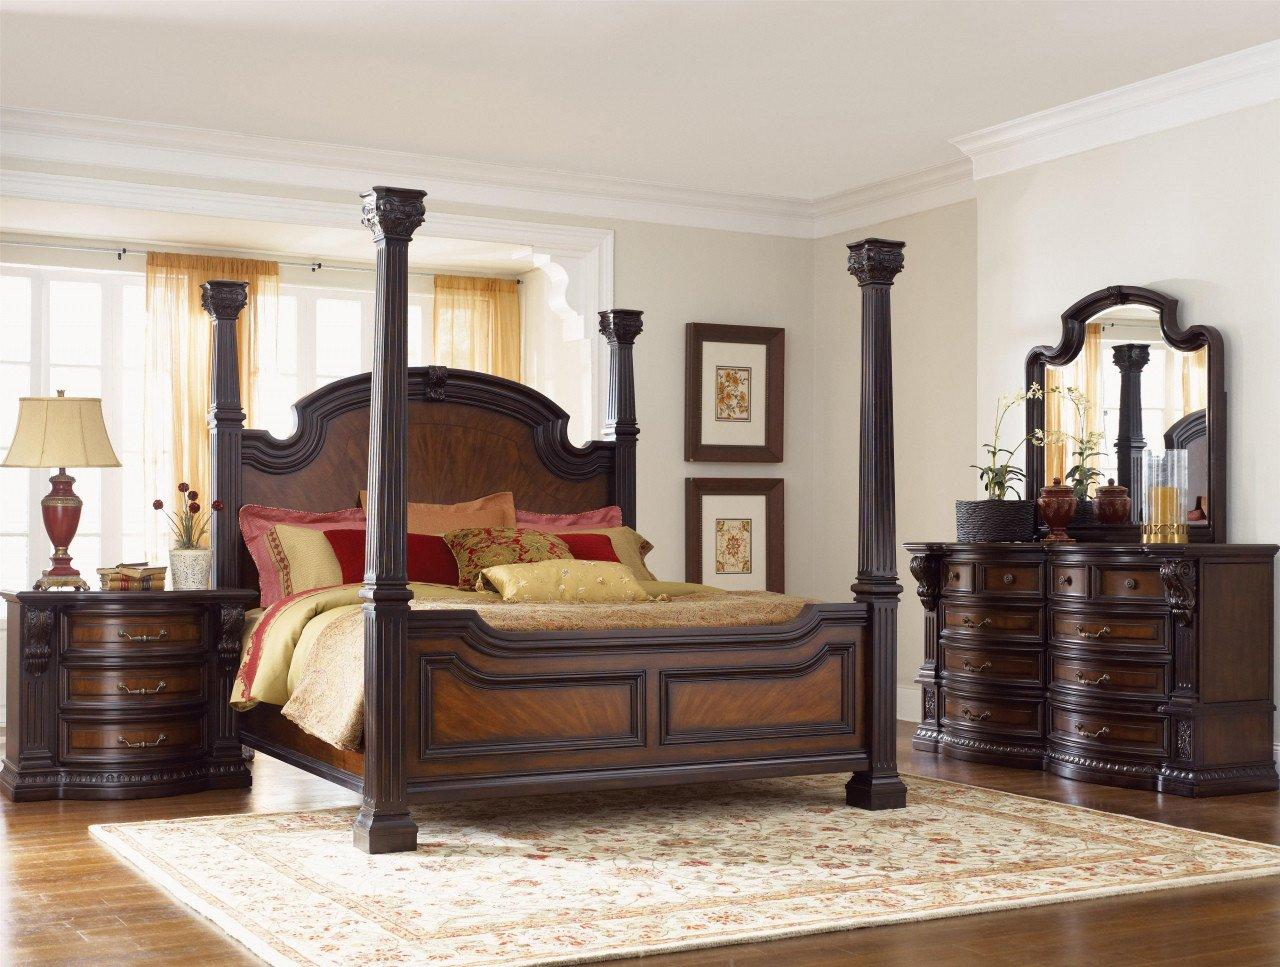 California King Canopy Bedroom Set Best Of Cal King Bedroom Sets — Procura Home Blog